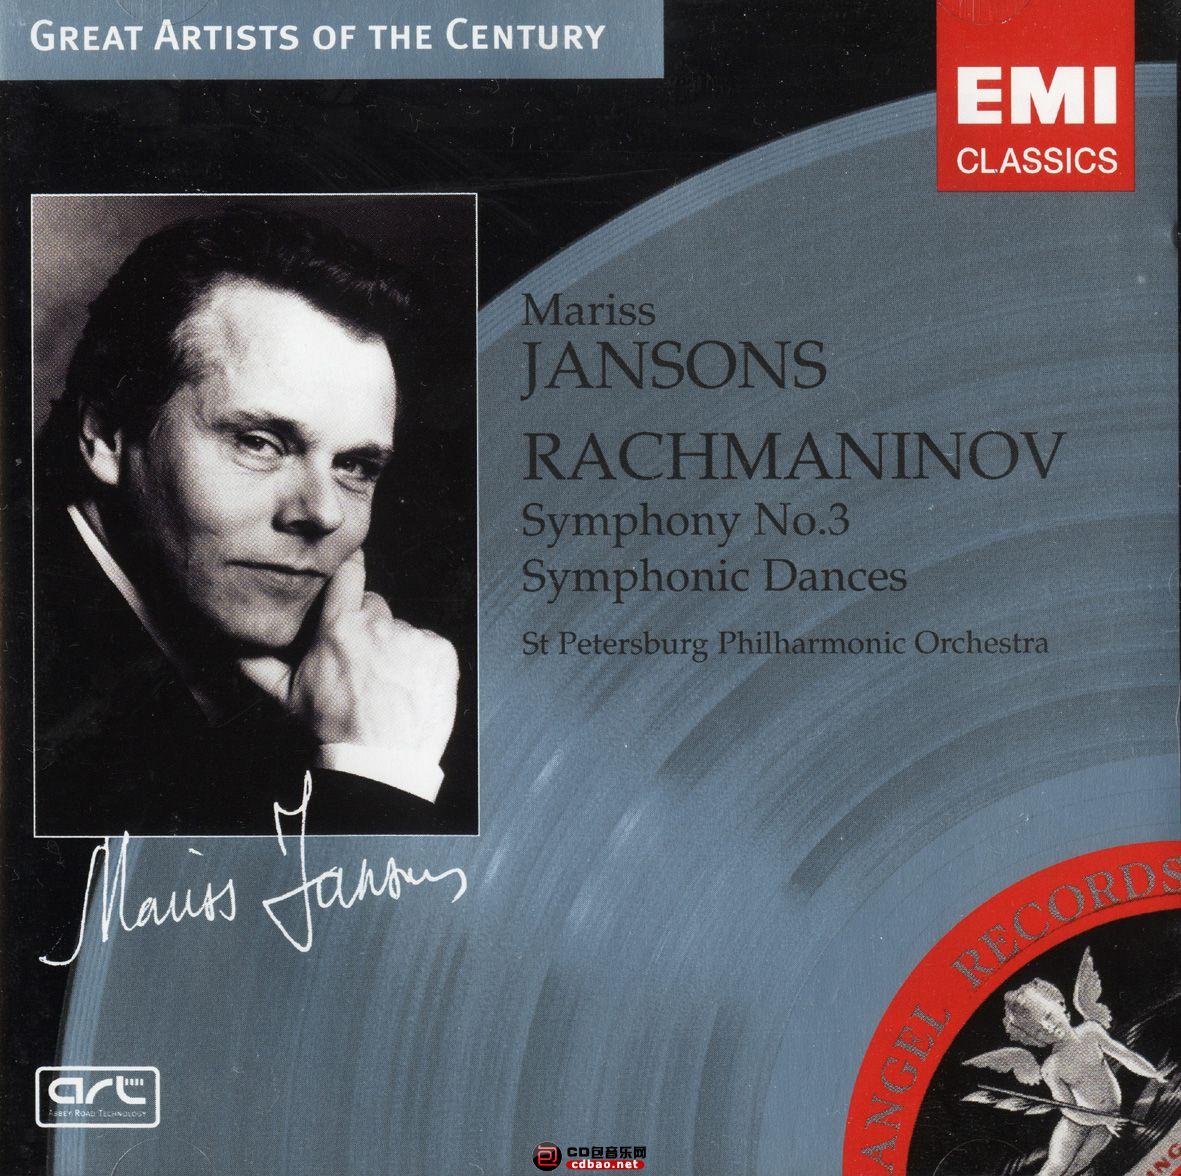 Jansons_Rachmaninov Sym No.3.01.jpg